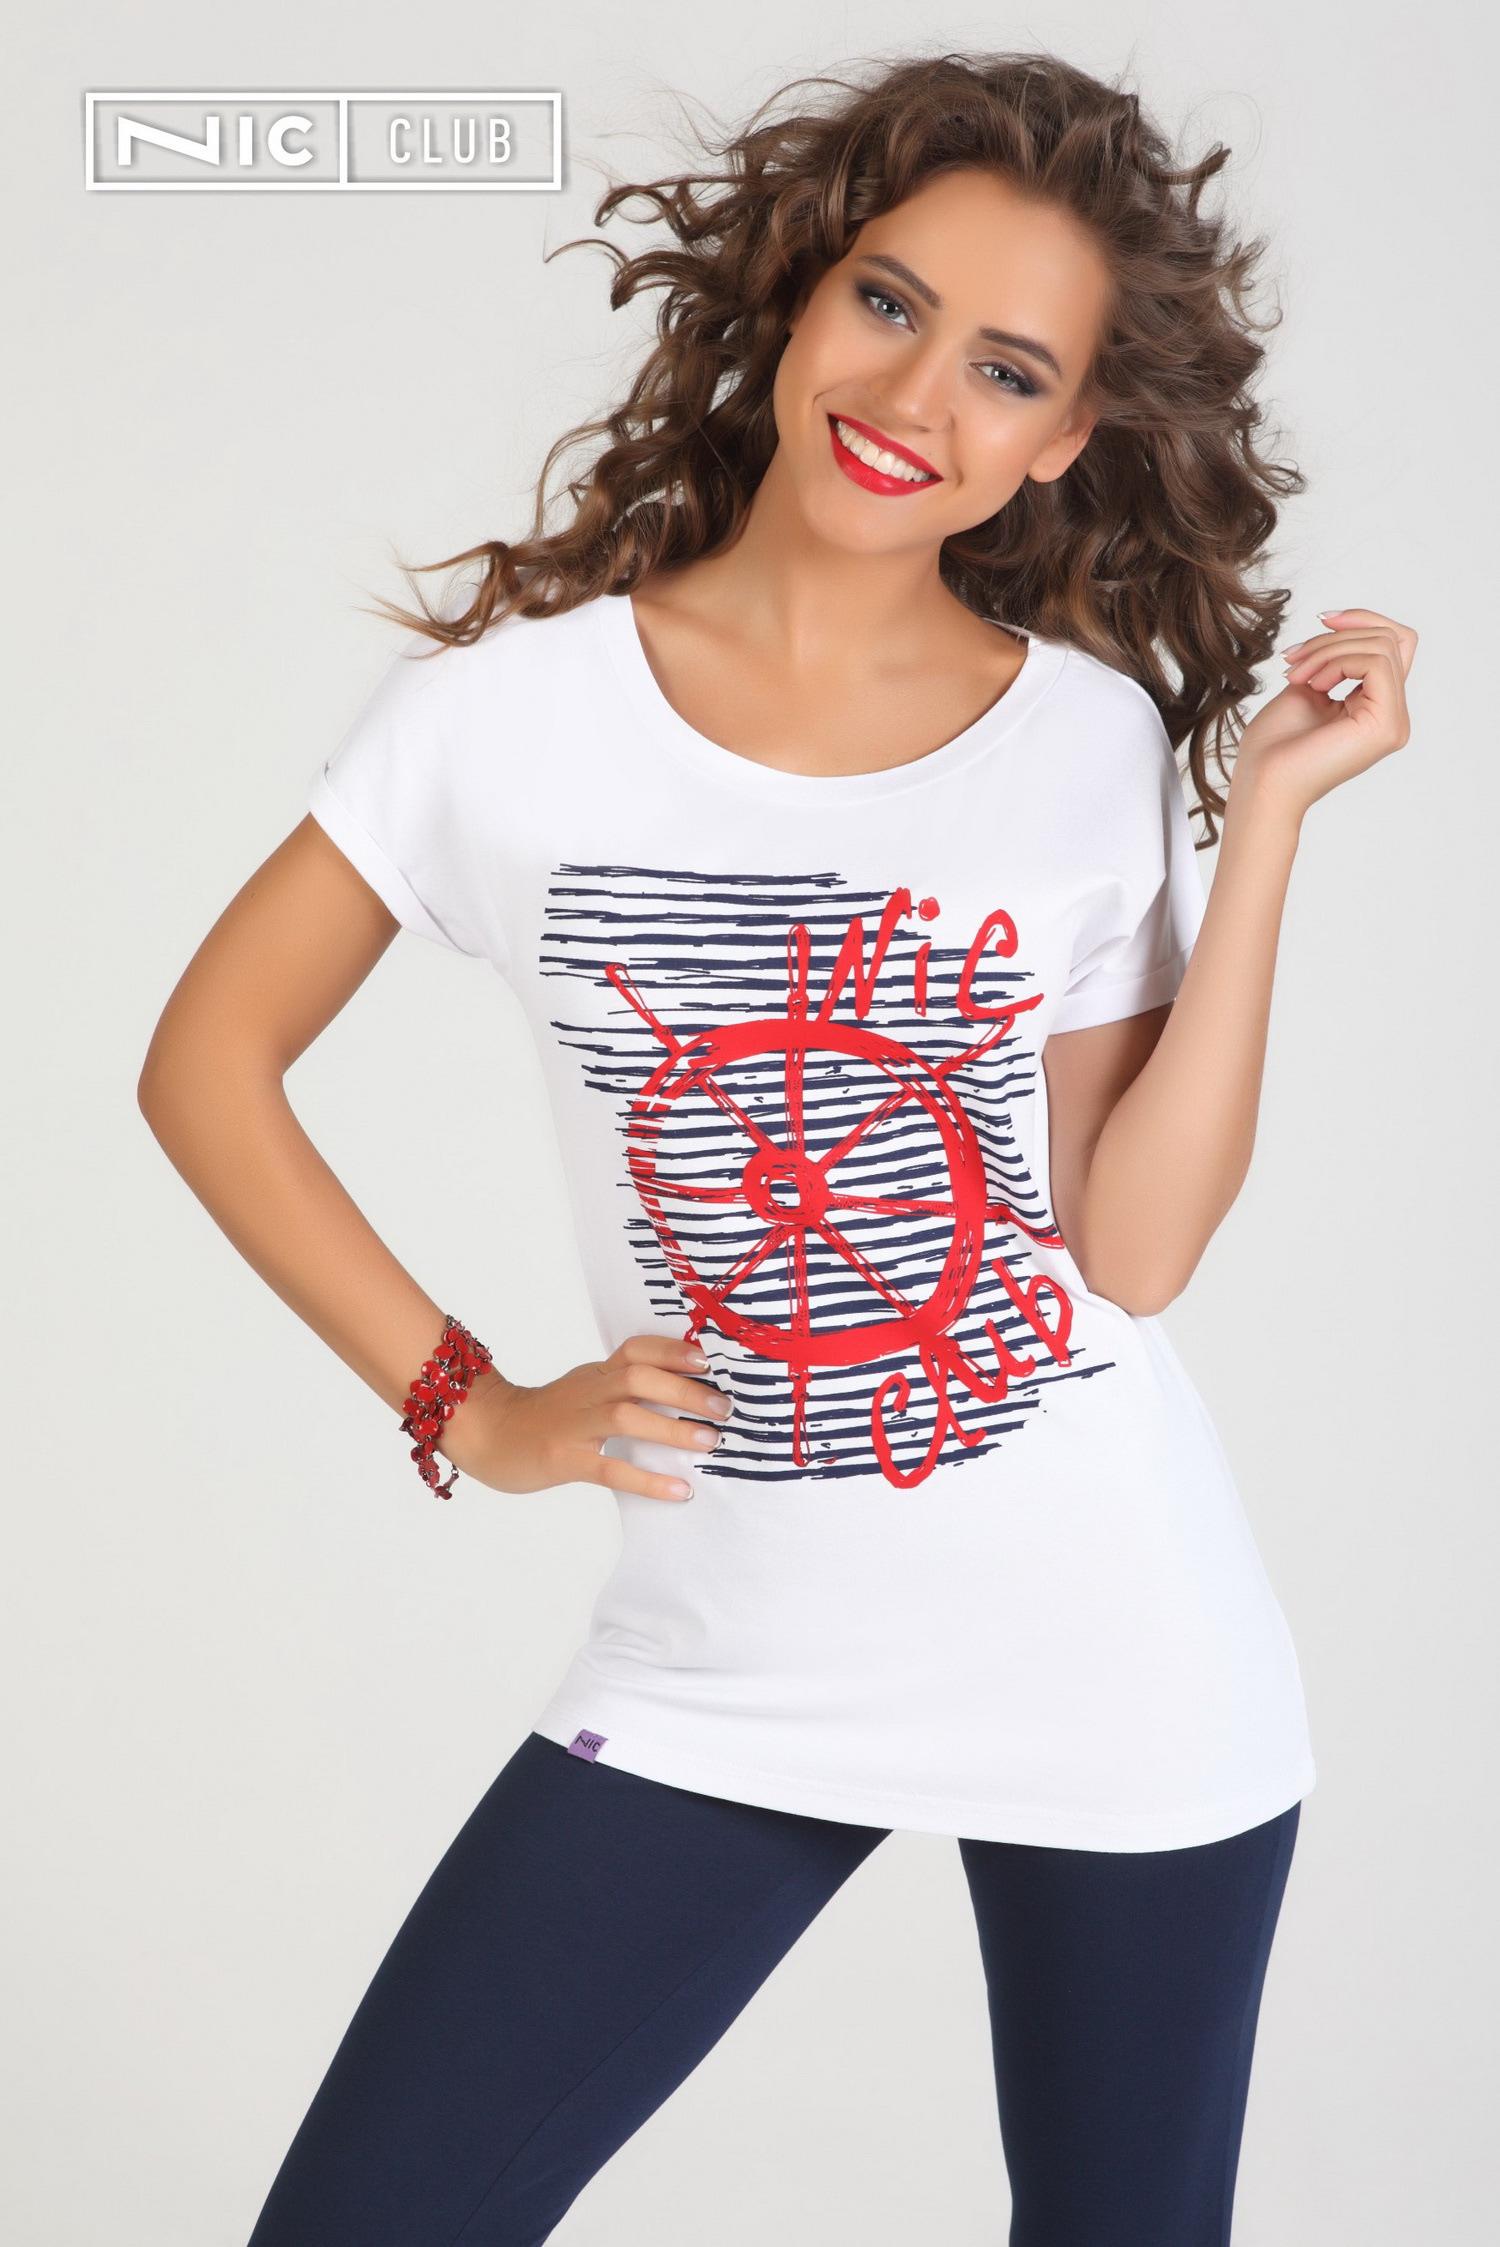 Комплект: футболка и брюки, Costa Marina, Nic Club